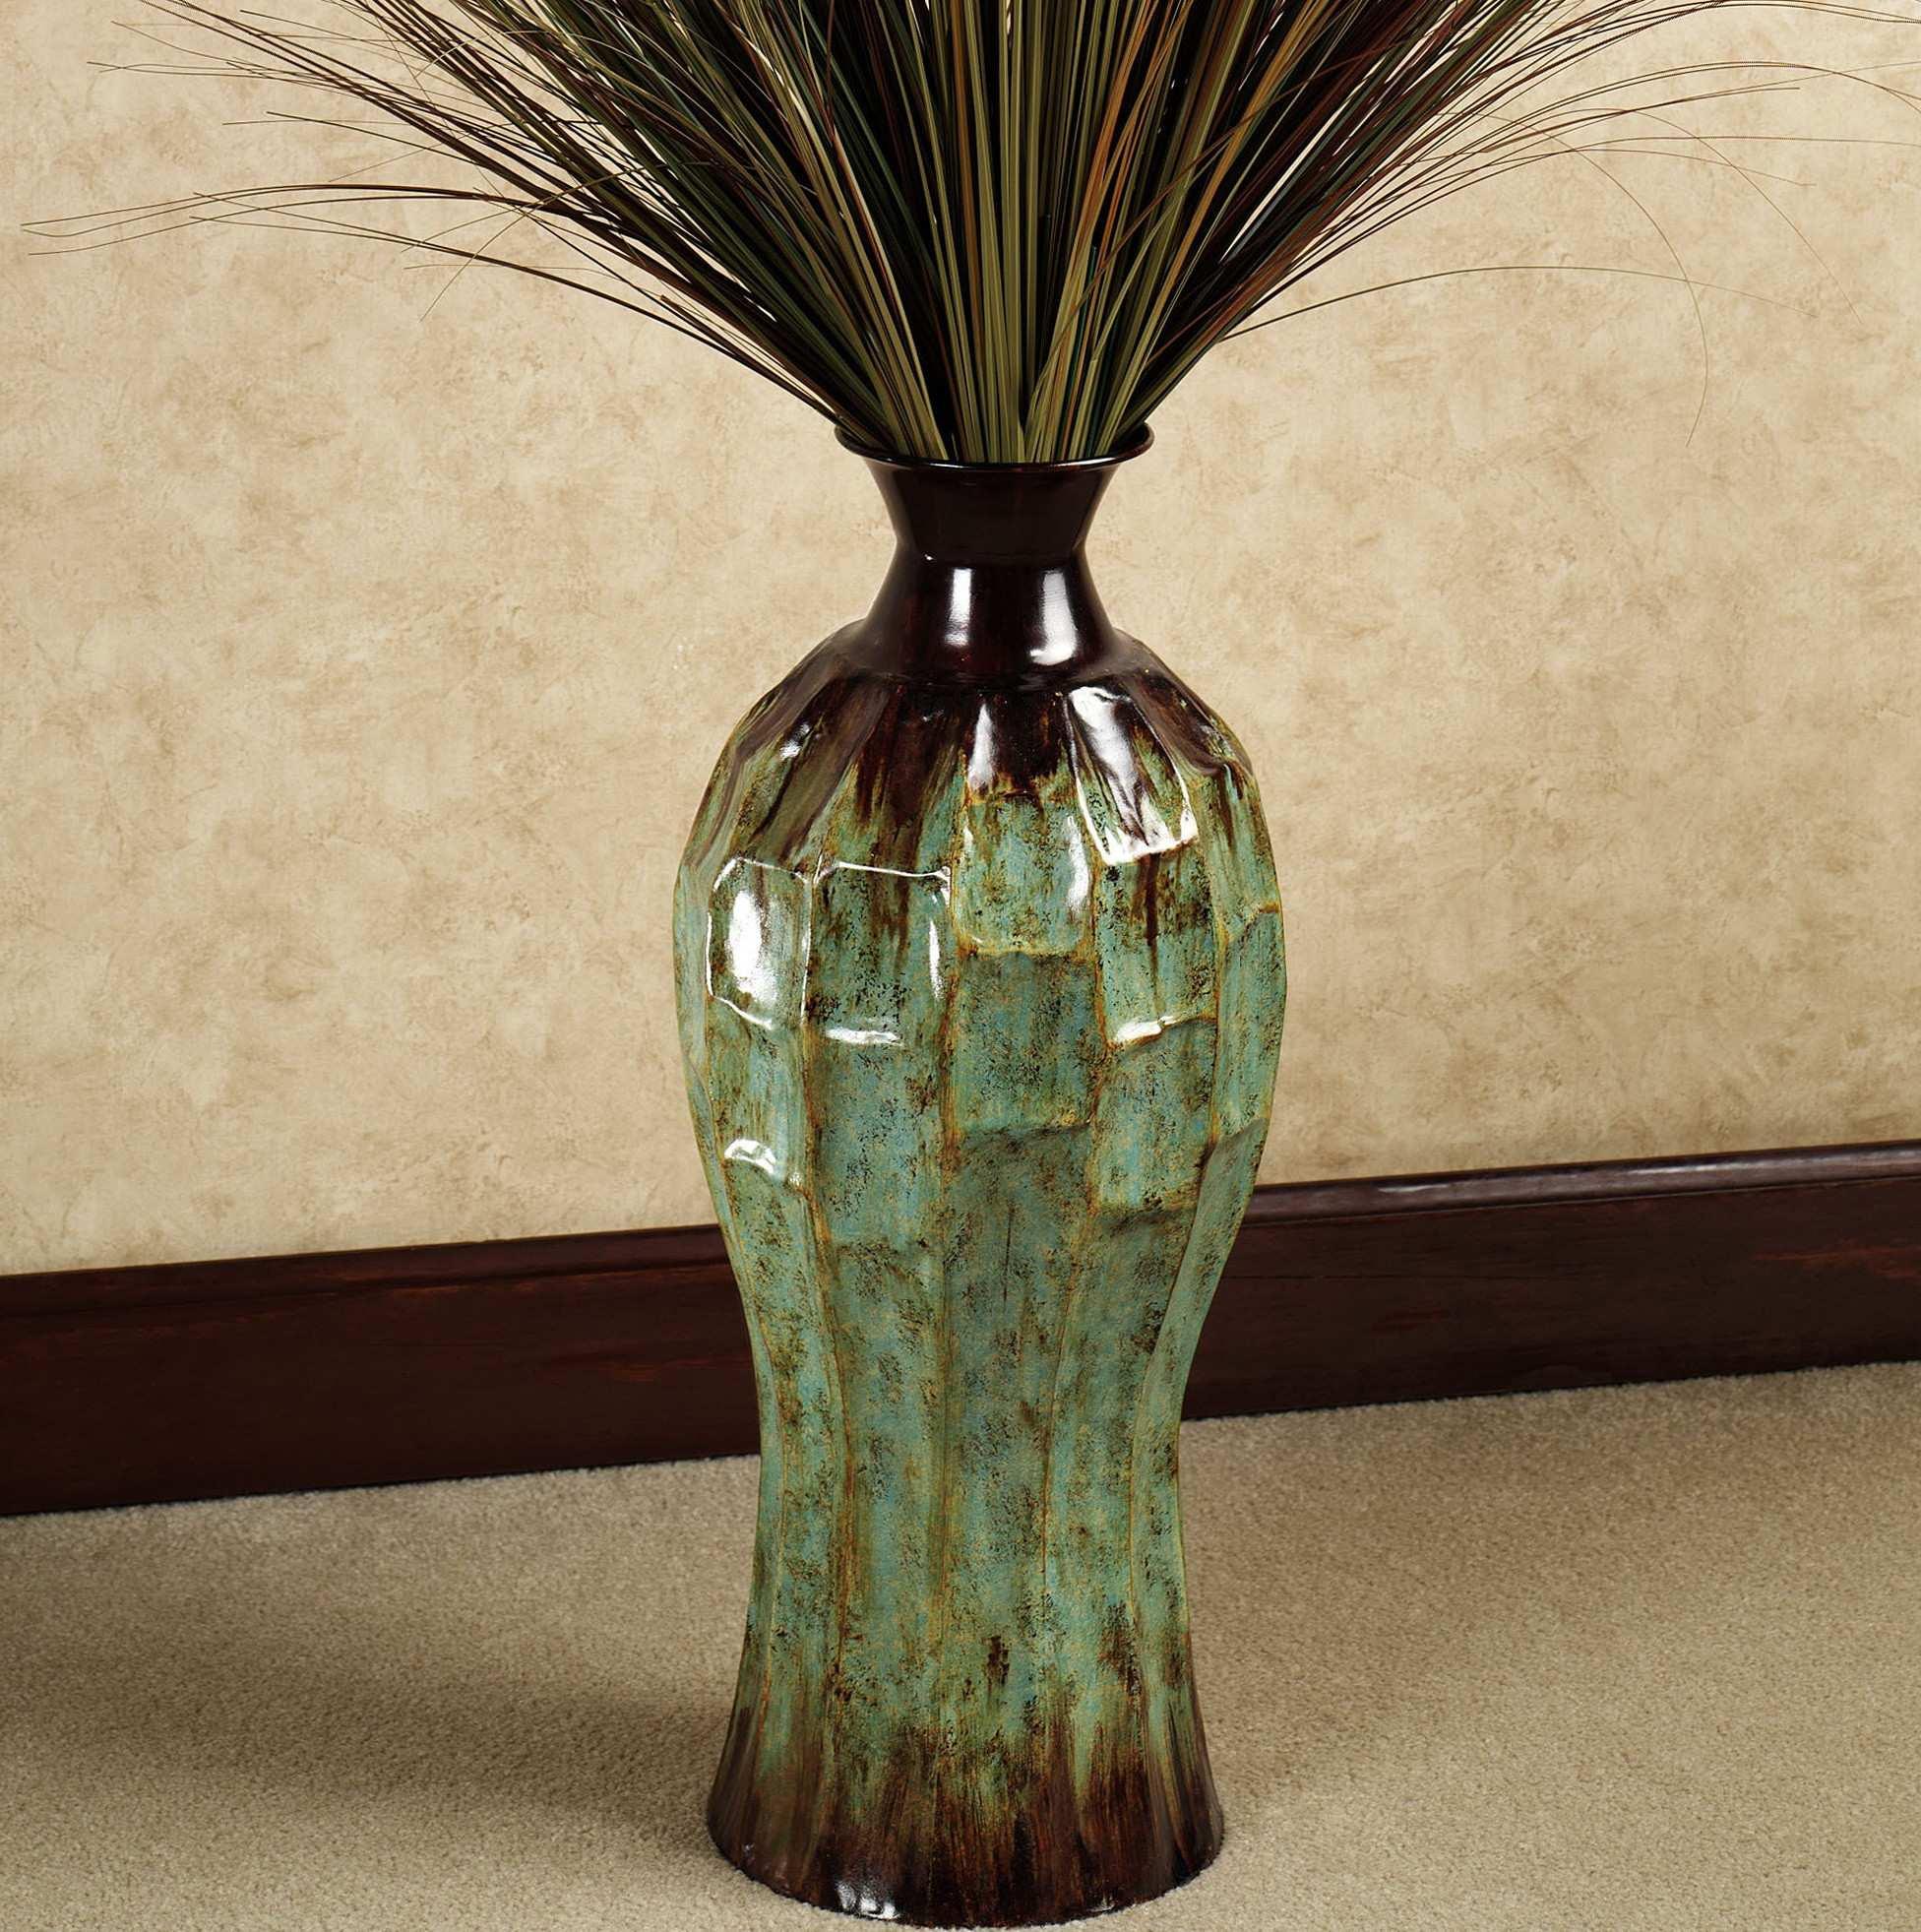 decorative floor vases of decorative floor vases www topsimages com for elegant decorative sticks for floor vases for floor vase arrangement ideas filler image jpg 1952x1963 decorative